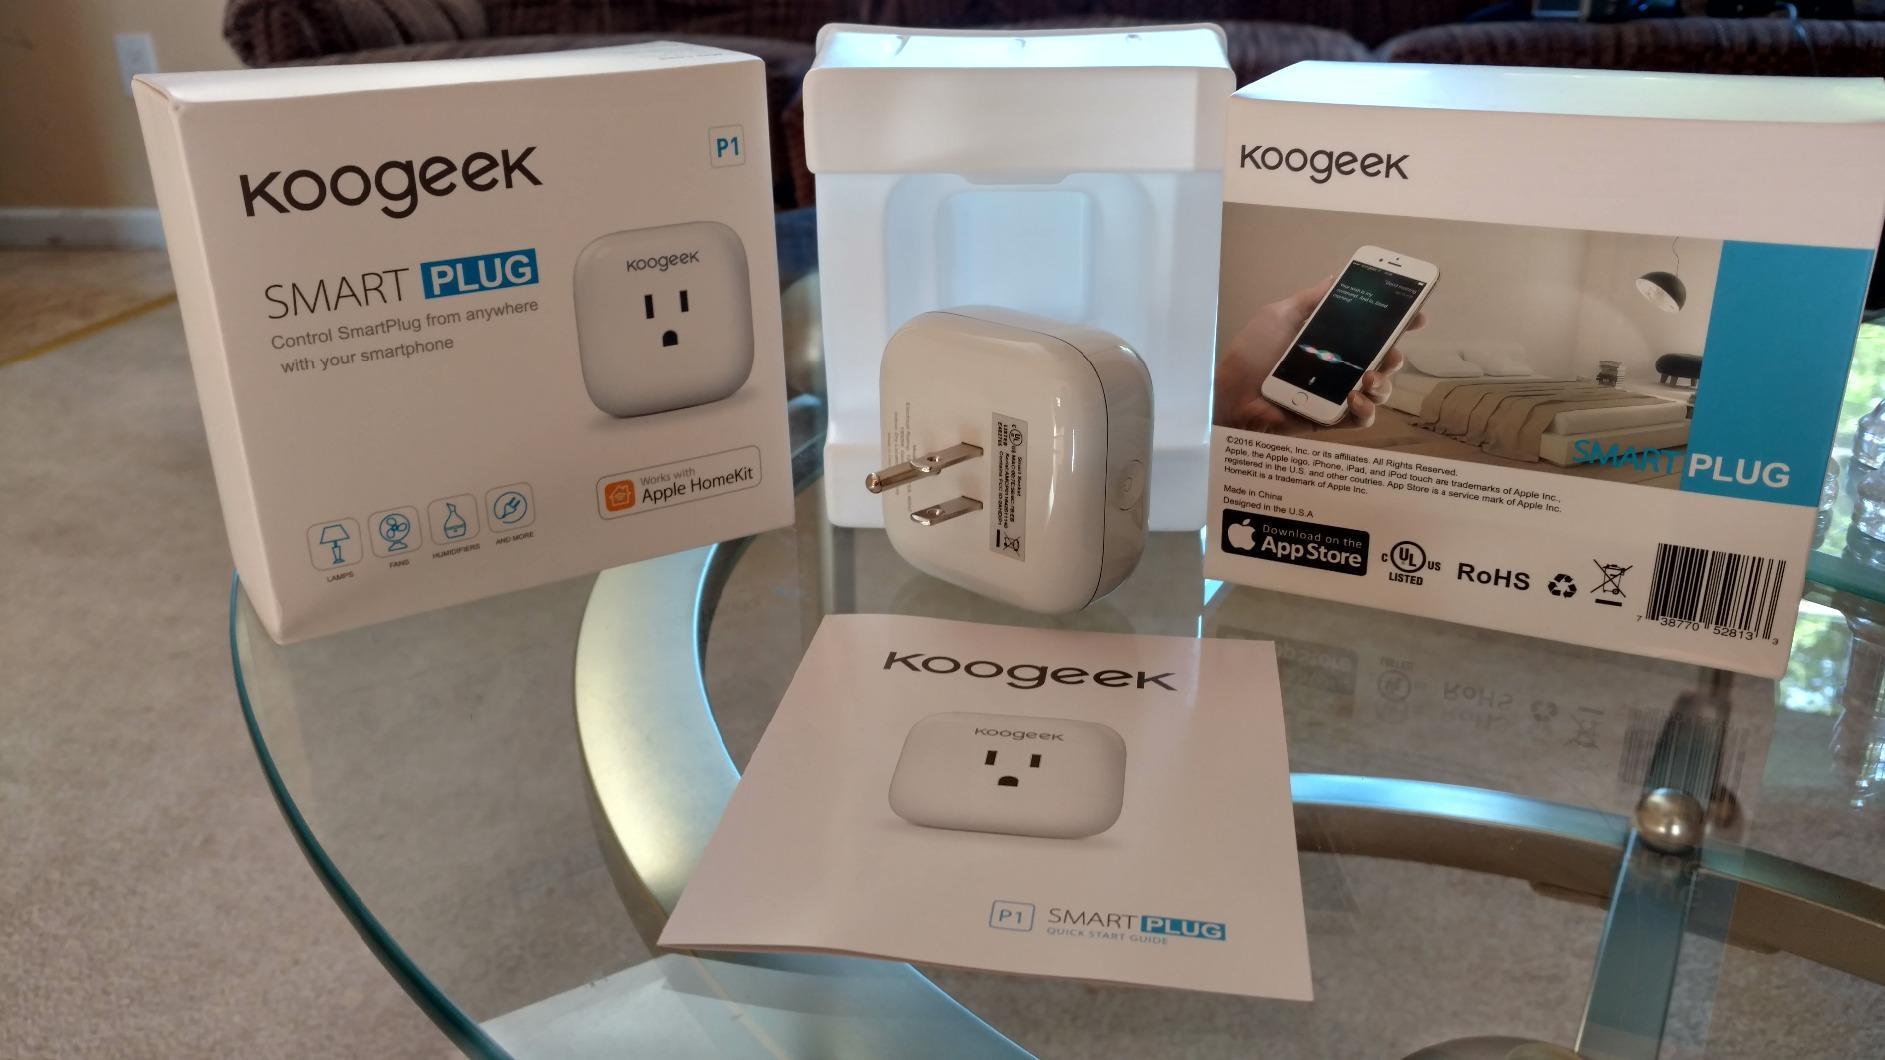 Koogeek Wi-Fi Enabled Improved Smart Plug Works with Apple HomeKit and  Amazon Alexa